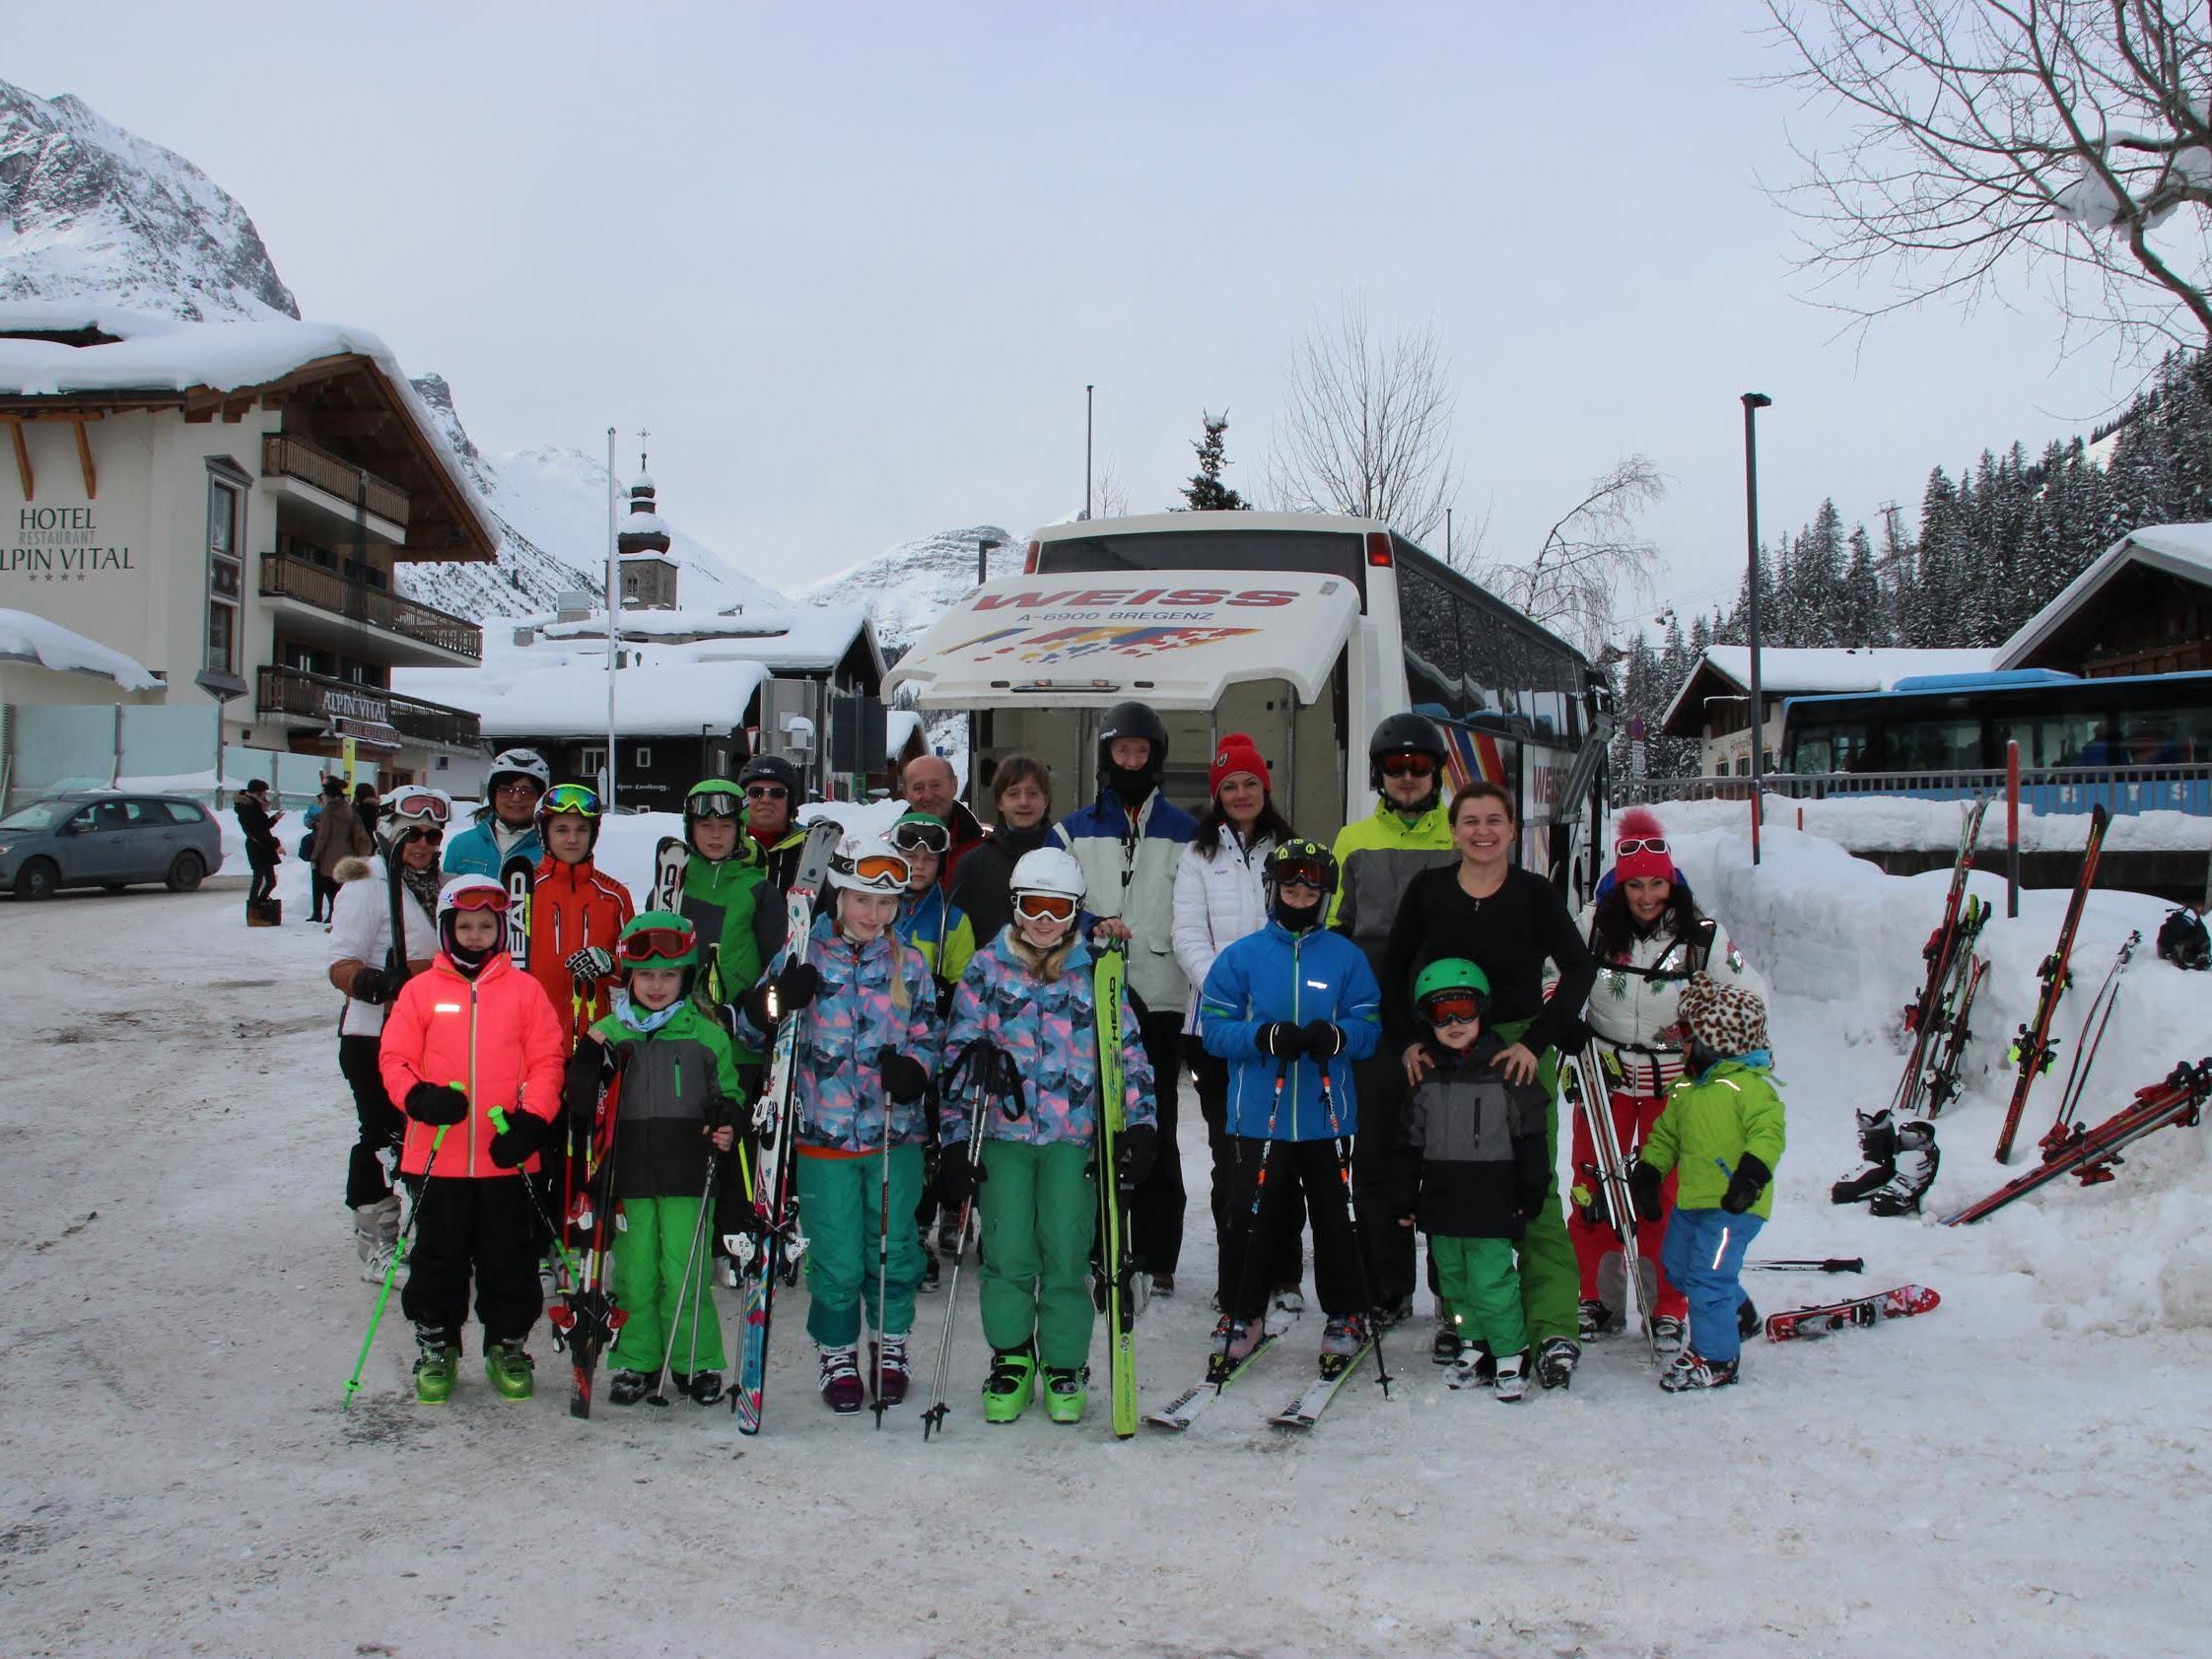 Gruppenfoto in Lech